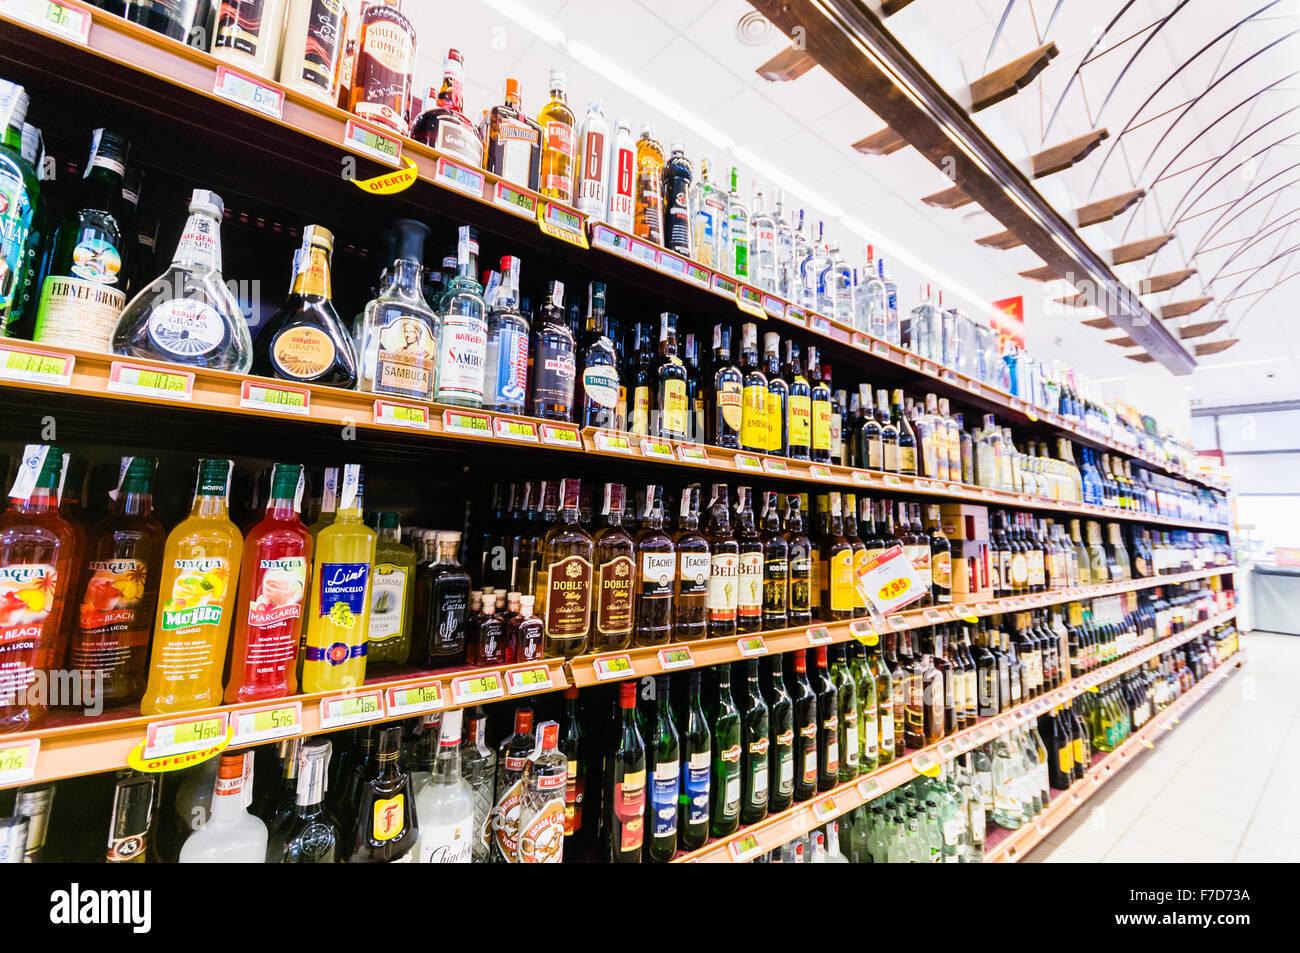 Cheap Vodka Stock Photos & Cheap Vodka Stock Images - Alamy